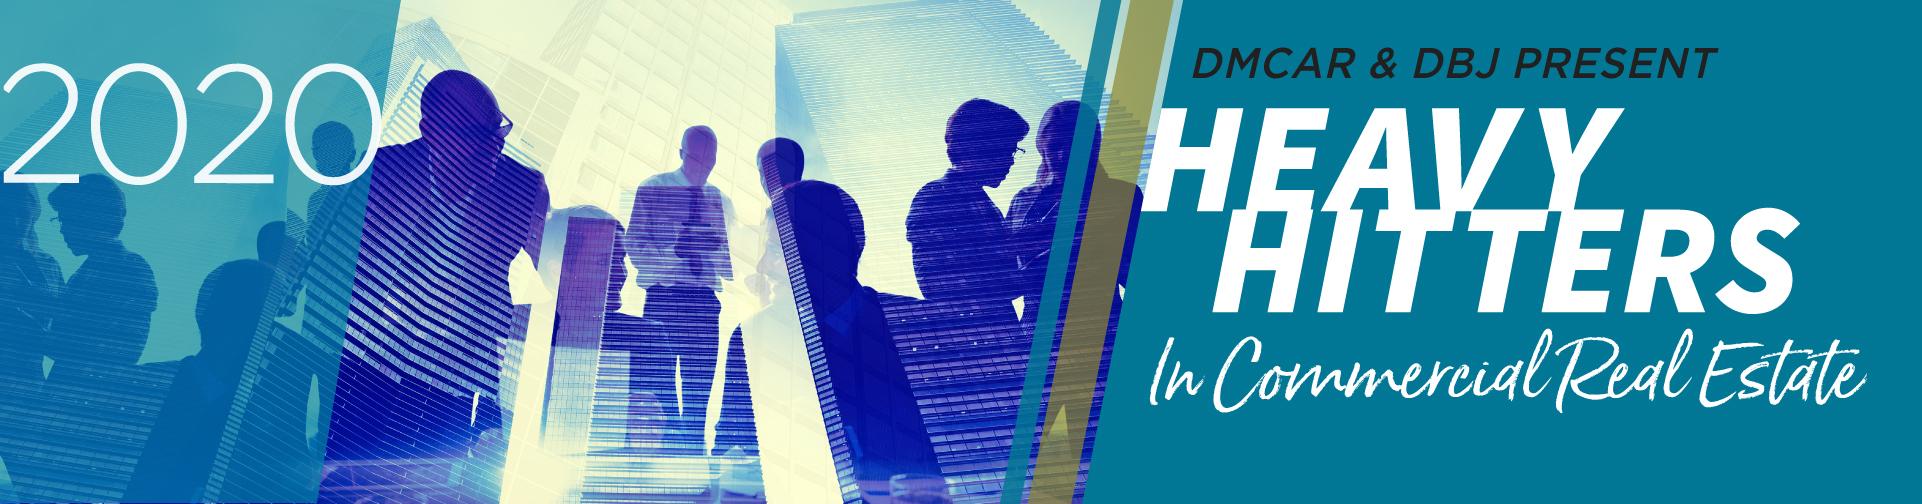 Denver March 2020 Events.Denver Commercial Association Of Realtors Heavy Hitters In